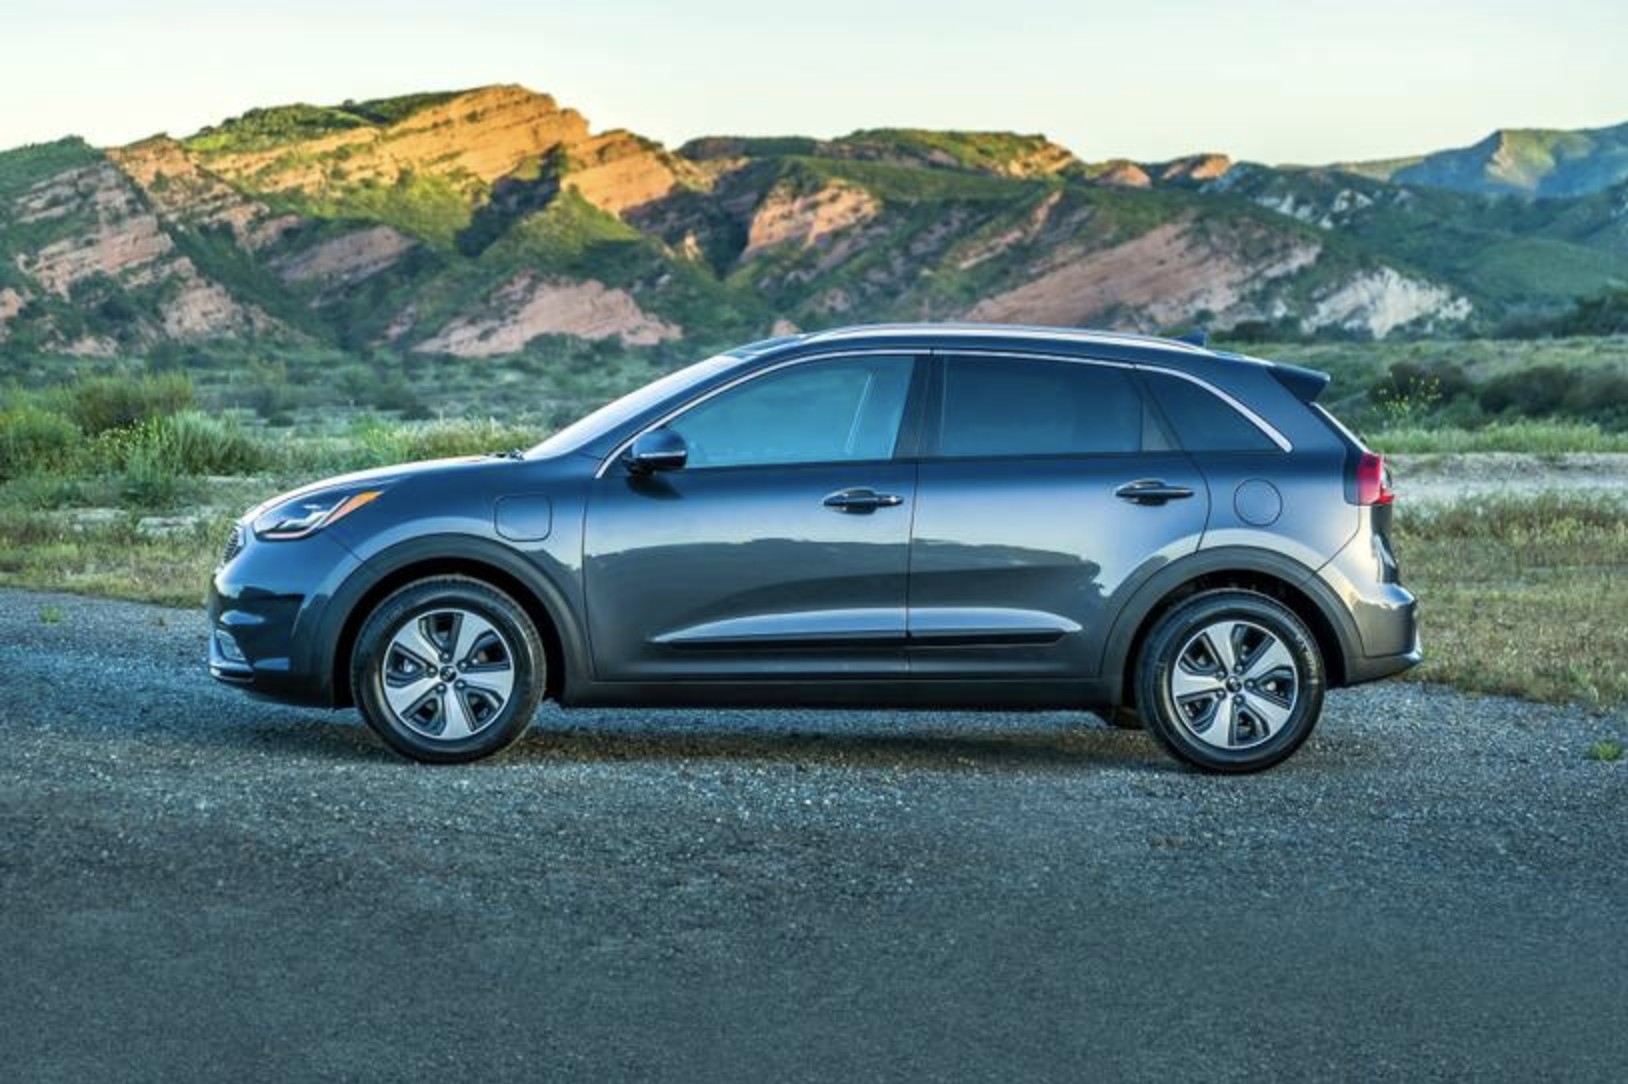 Car Industry Latest News Updates Autodeals Pk In 2020 Fuel Economy Kia Hatchback